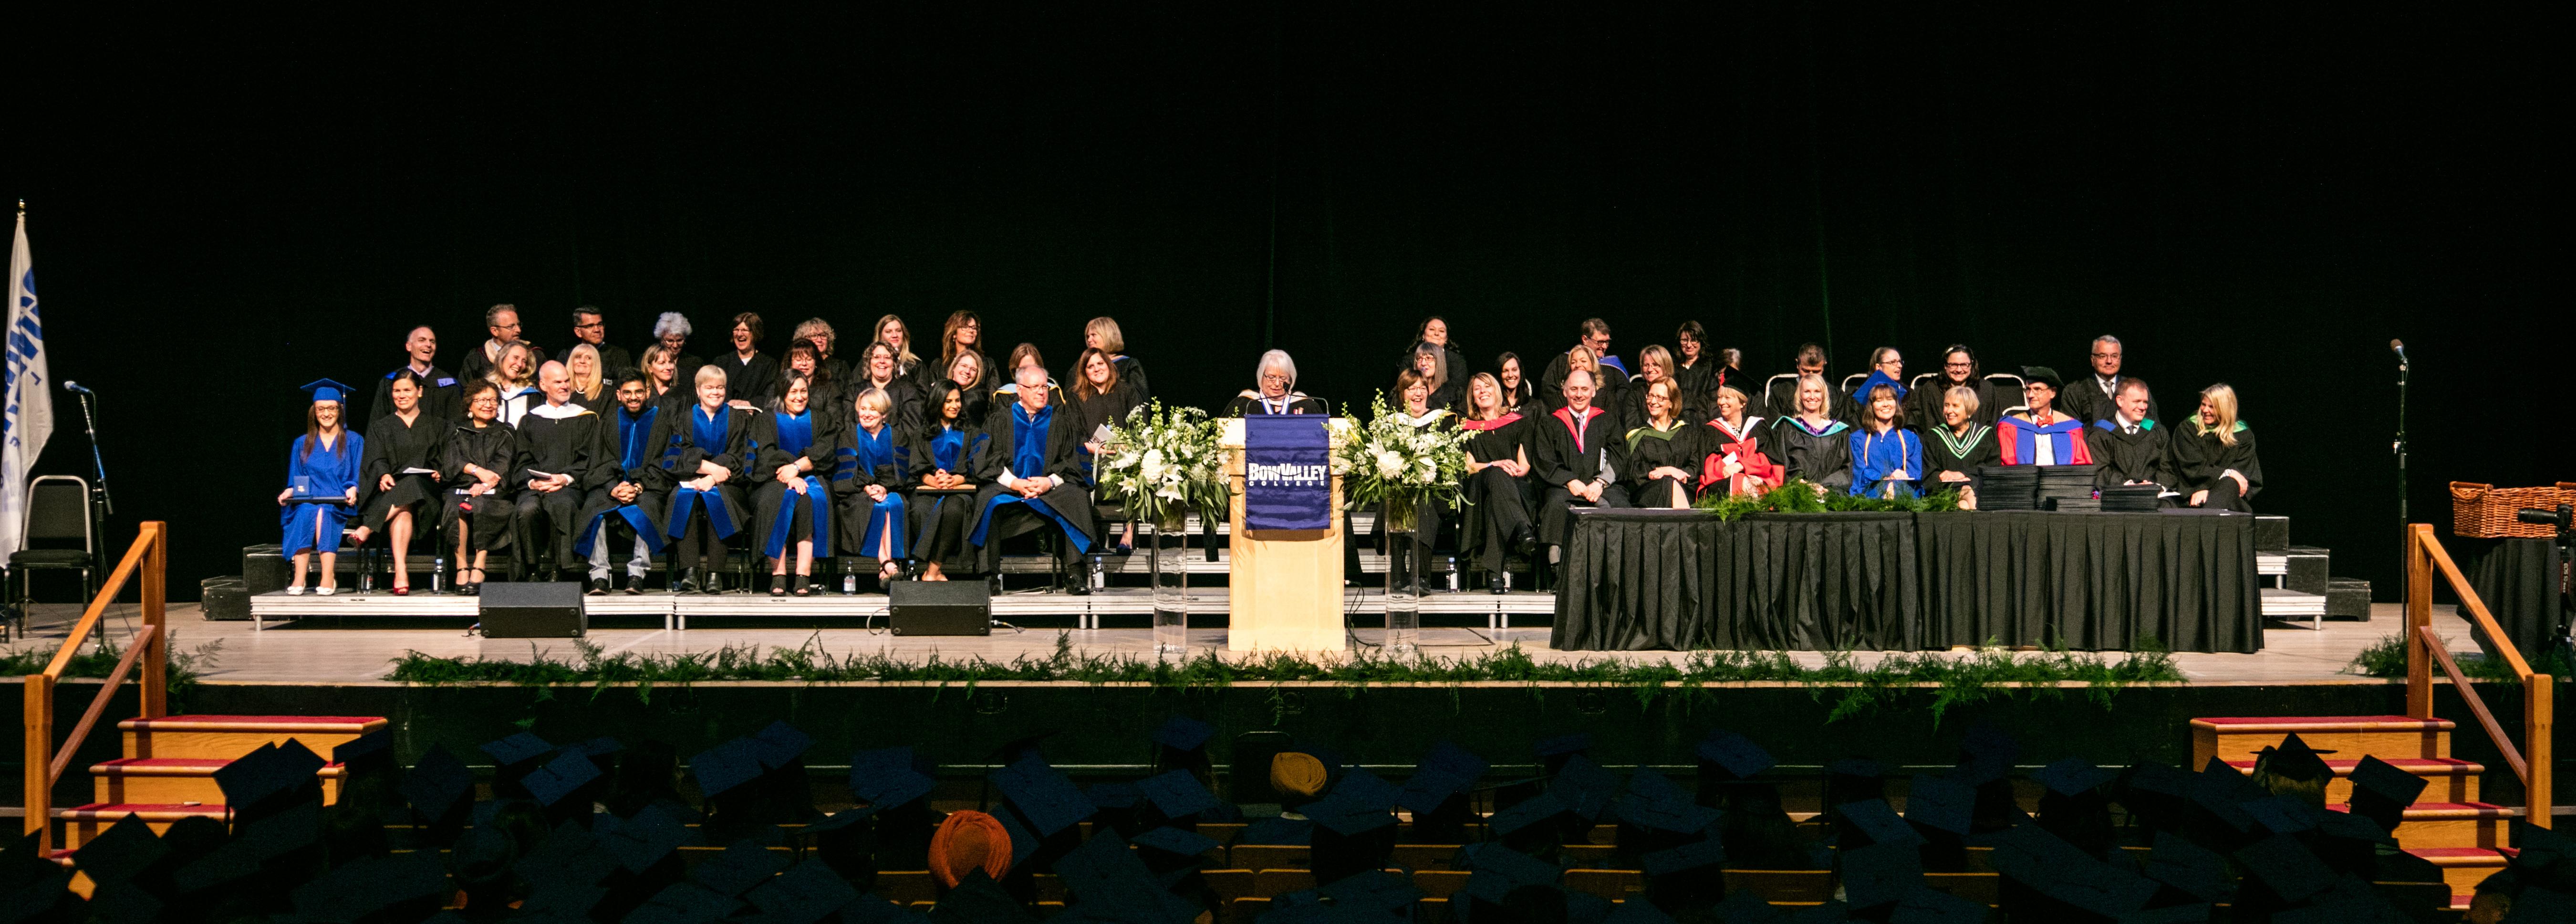 GradPhotography.ca Bow Valley College Grad-22